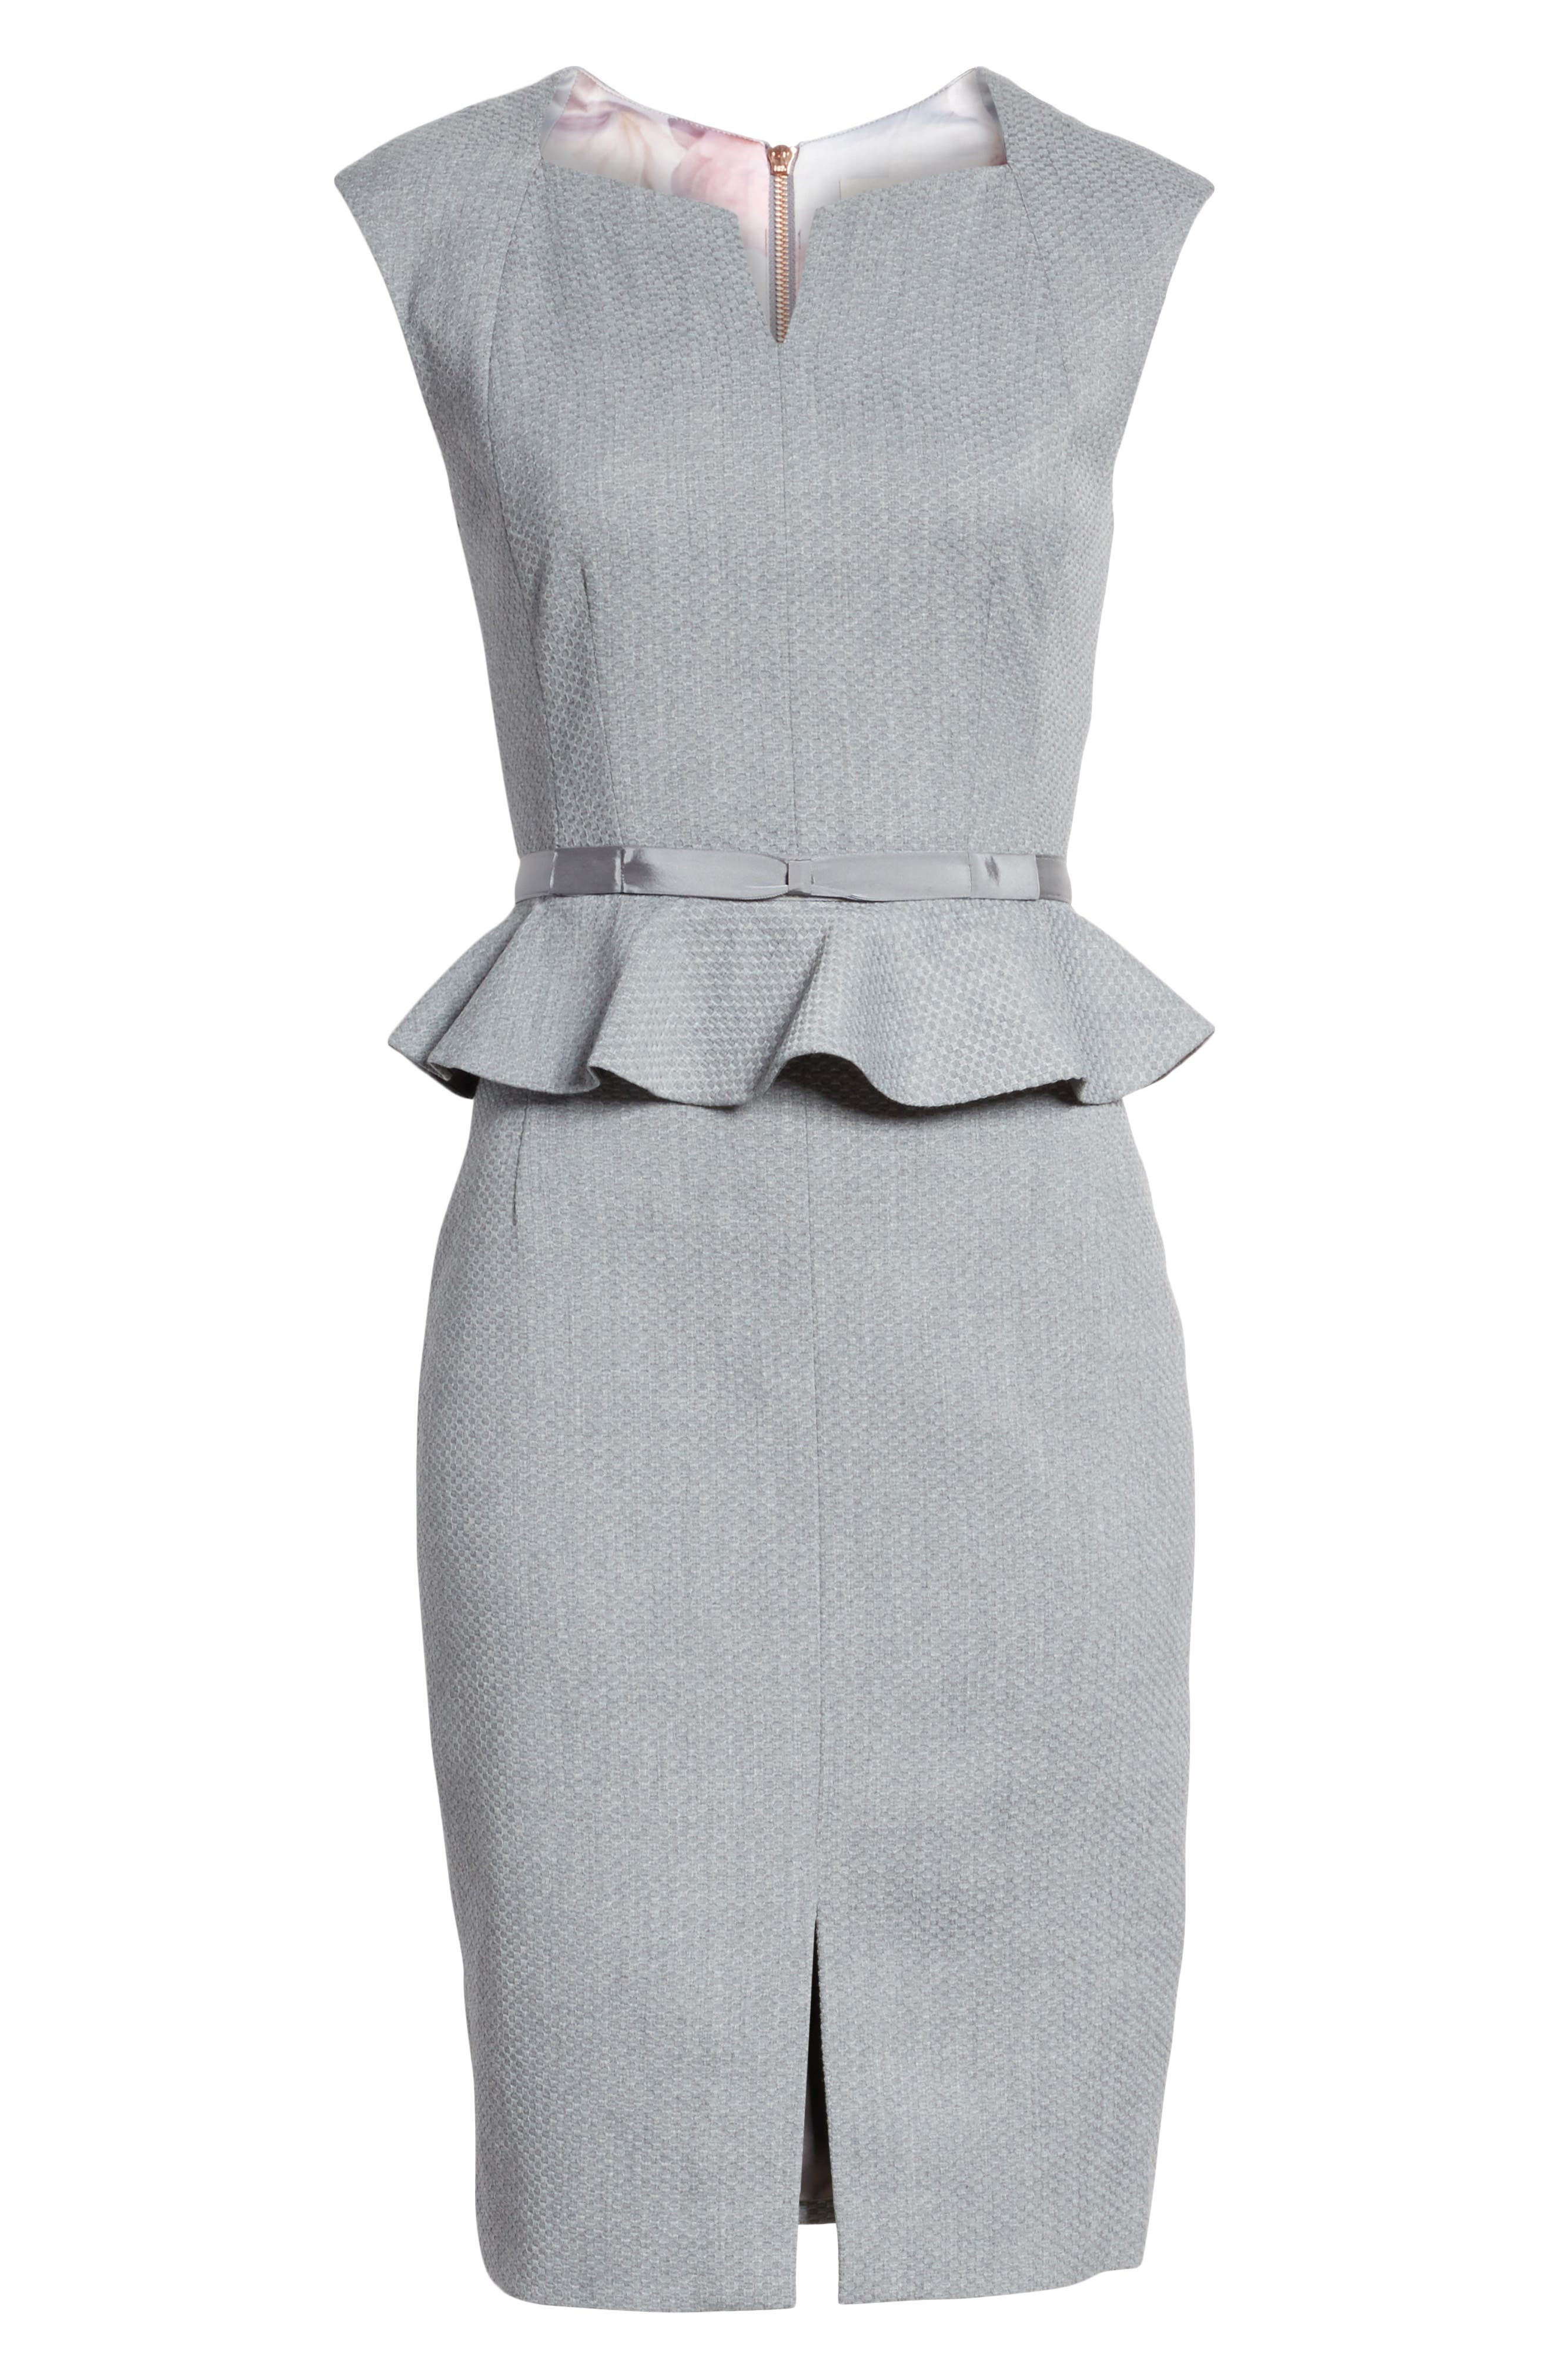 Nadaed Bow Detail Textured Peplum Dress,                             Alternate thumbnail 6, color,                             Mid Grey